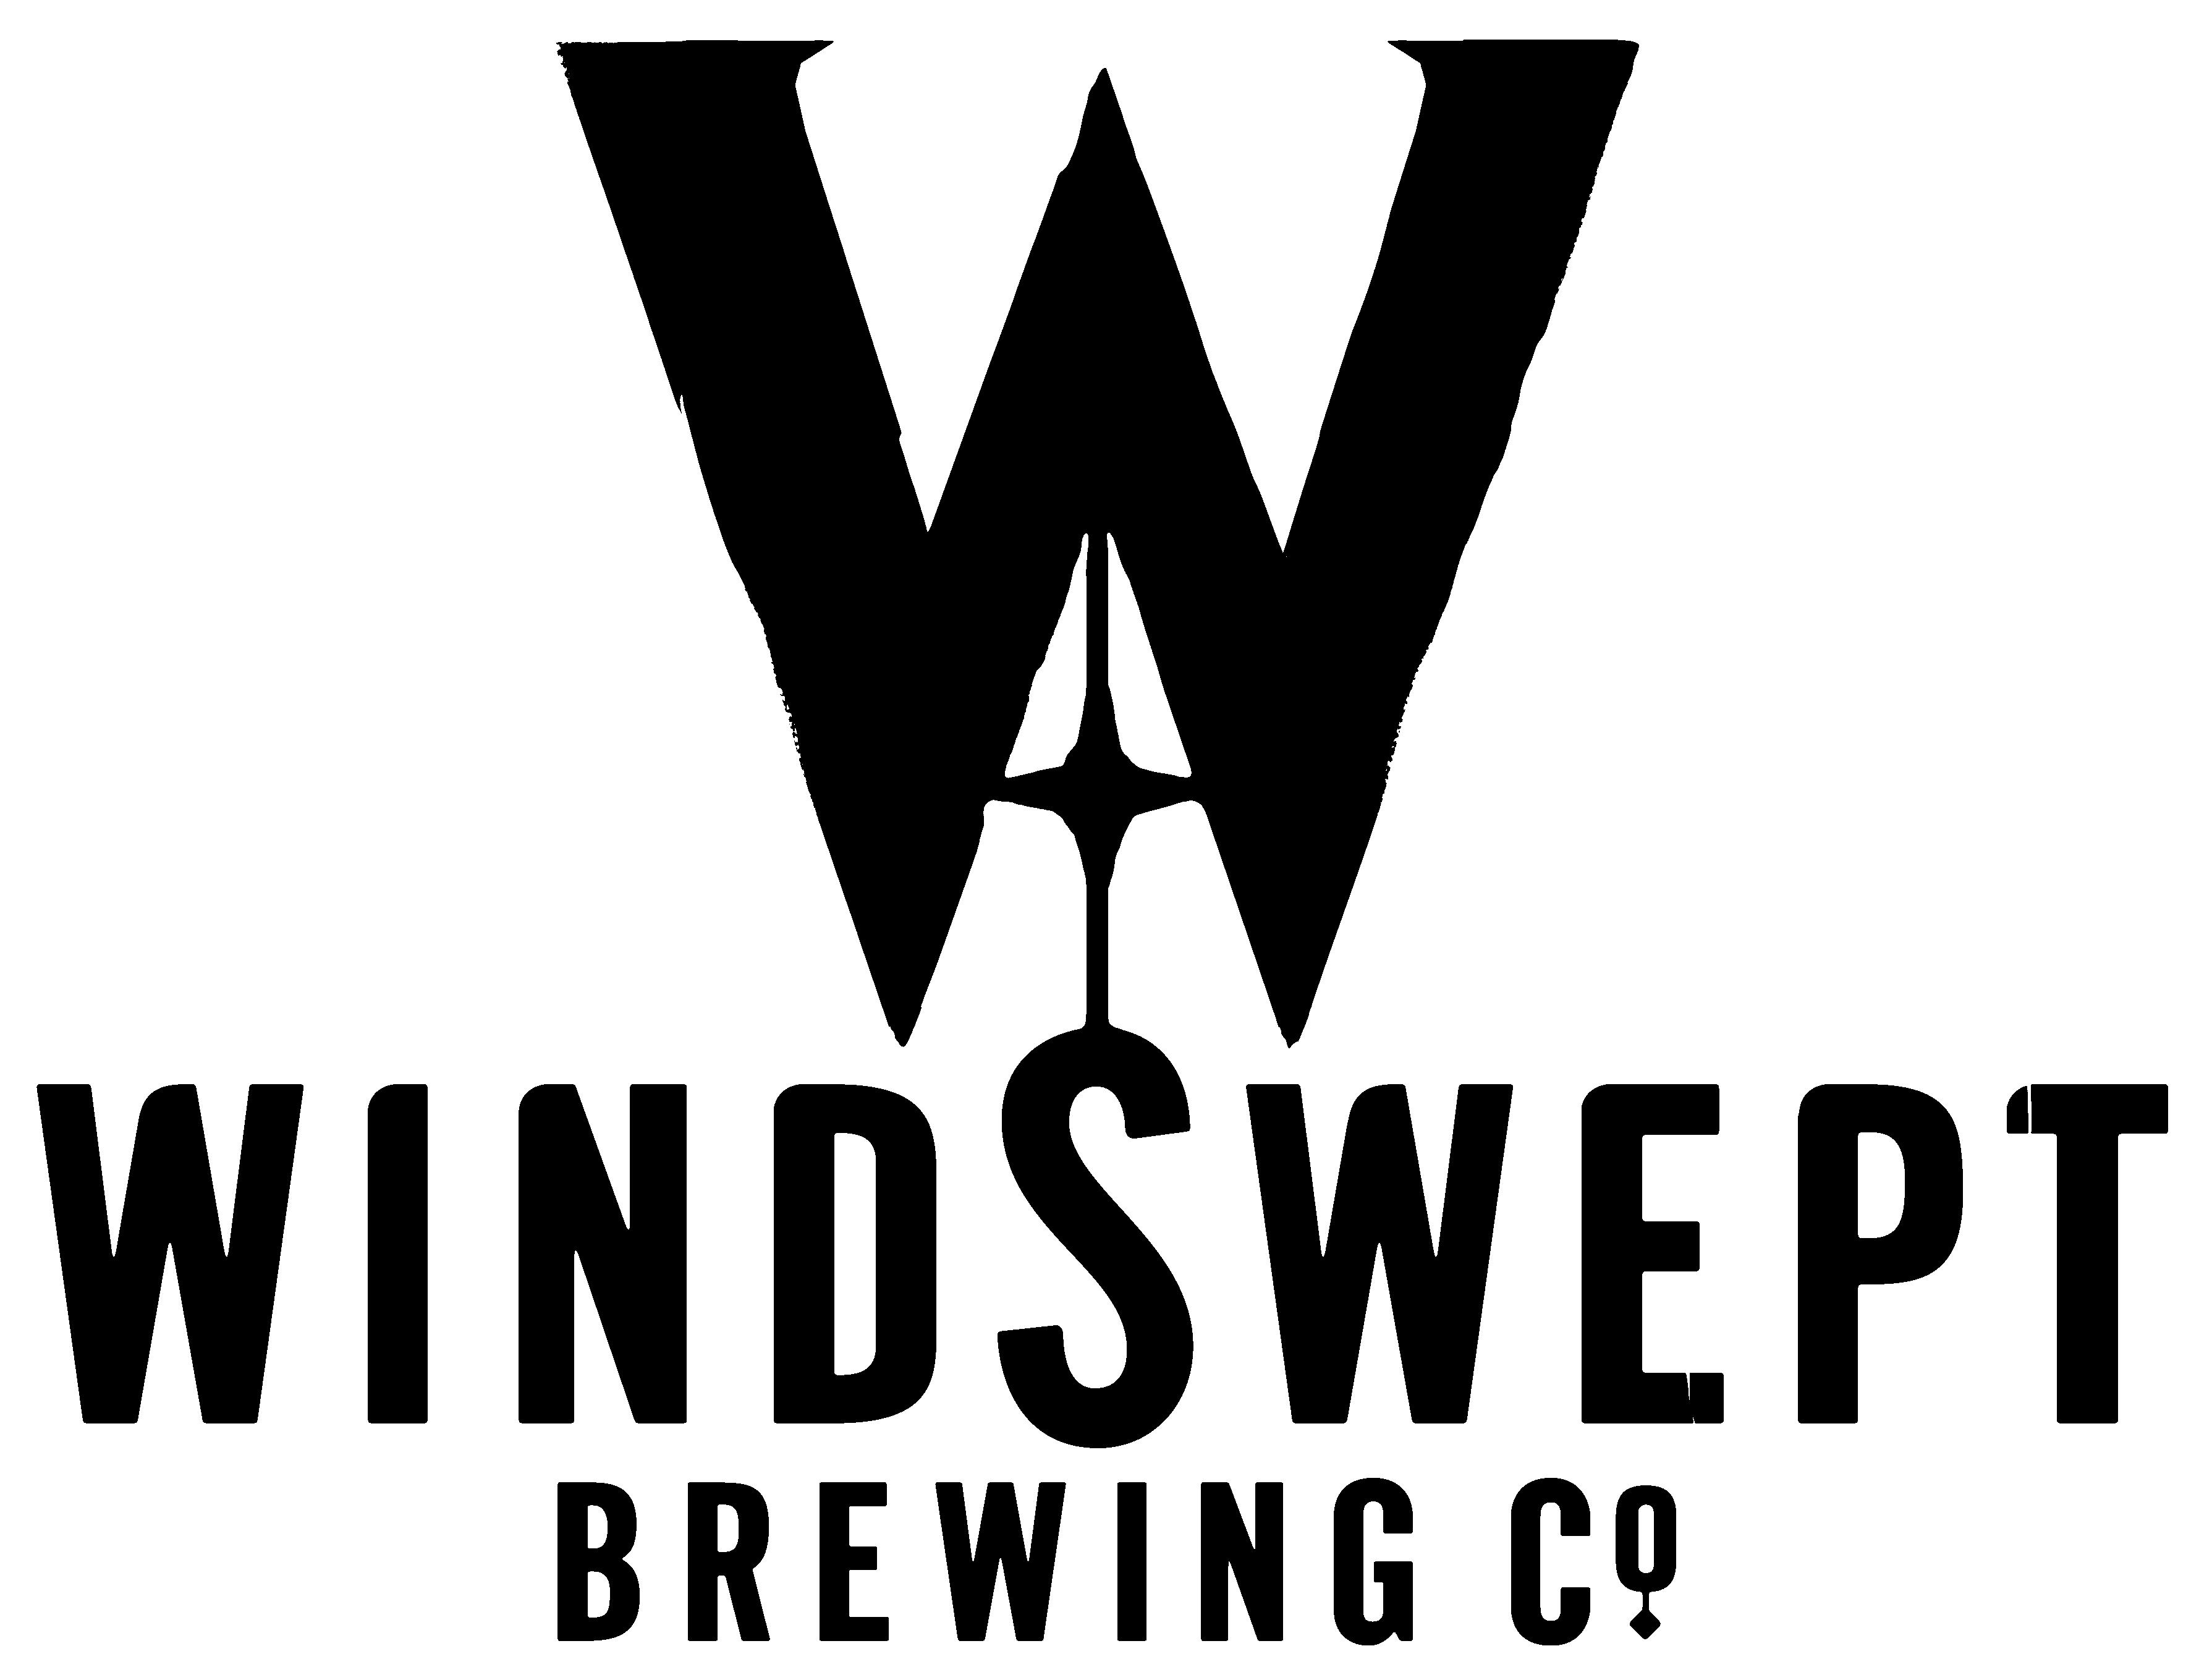 Windswept Brewing